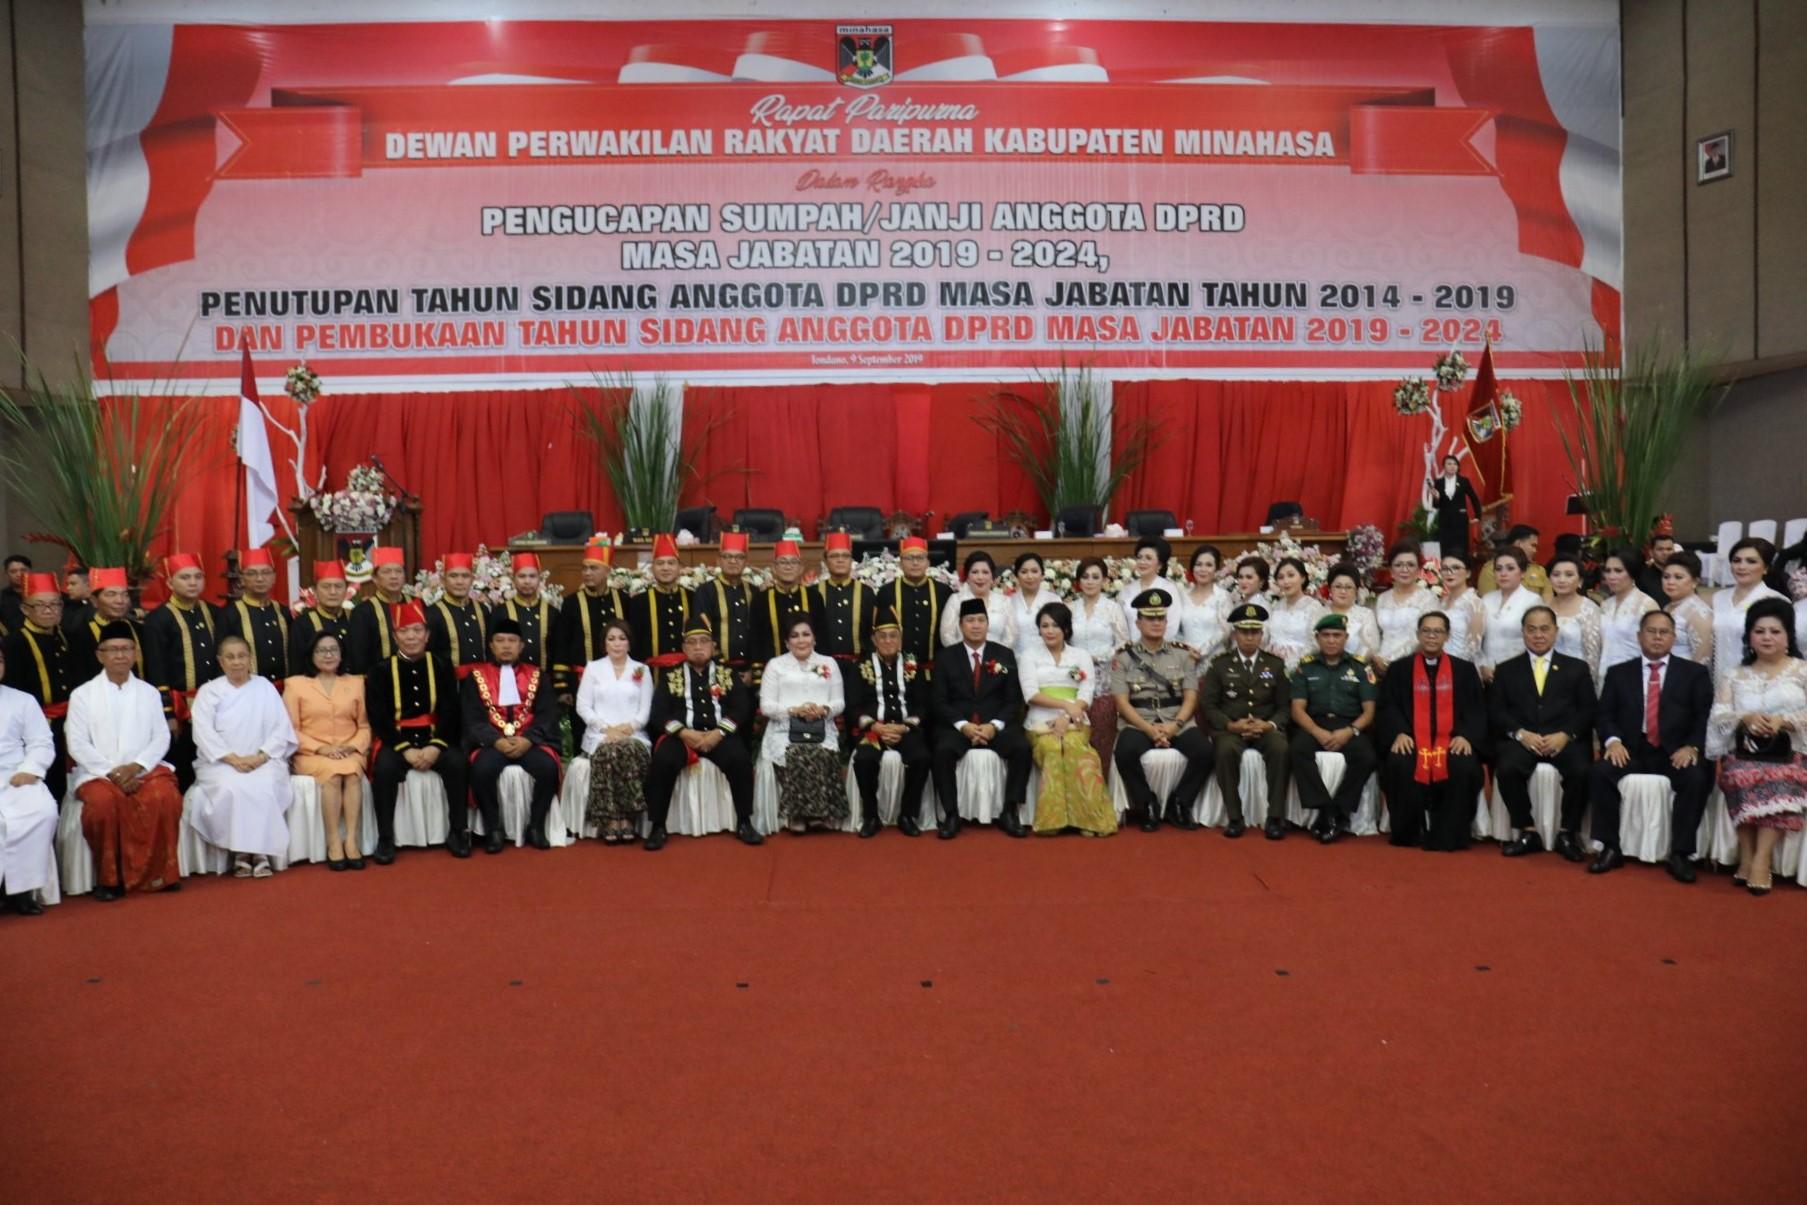 Anggota DPRD Kabupaten Minahasa periode 2019-2024.